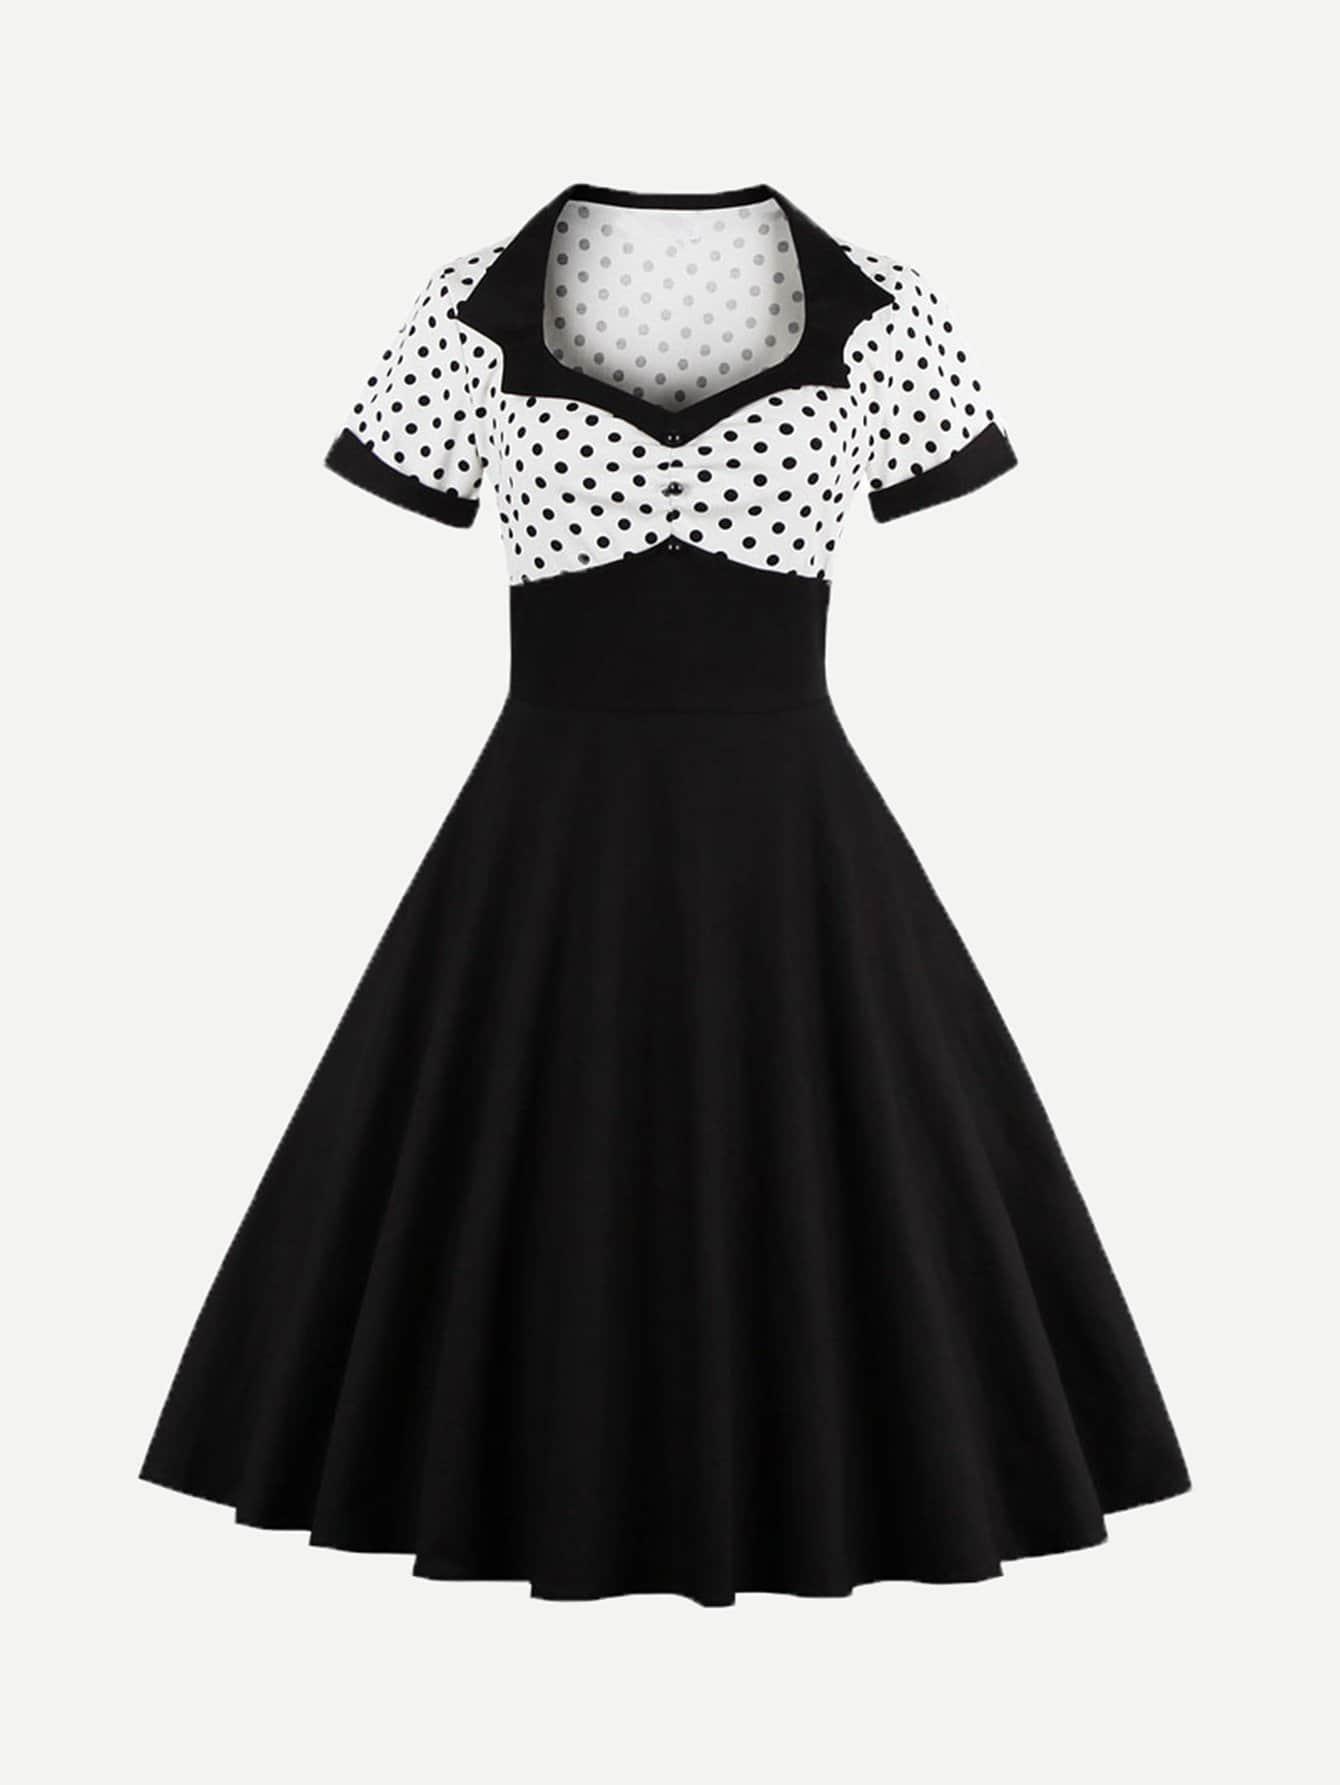 Button Front Polka Dot Top Dress button front halterneck polka dot top